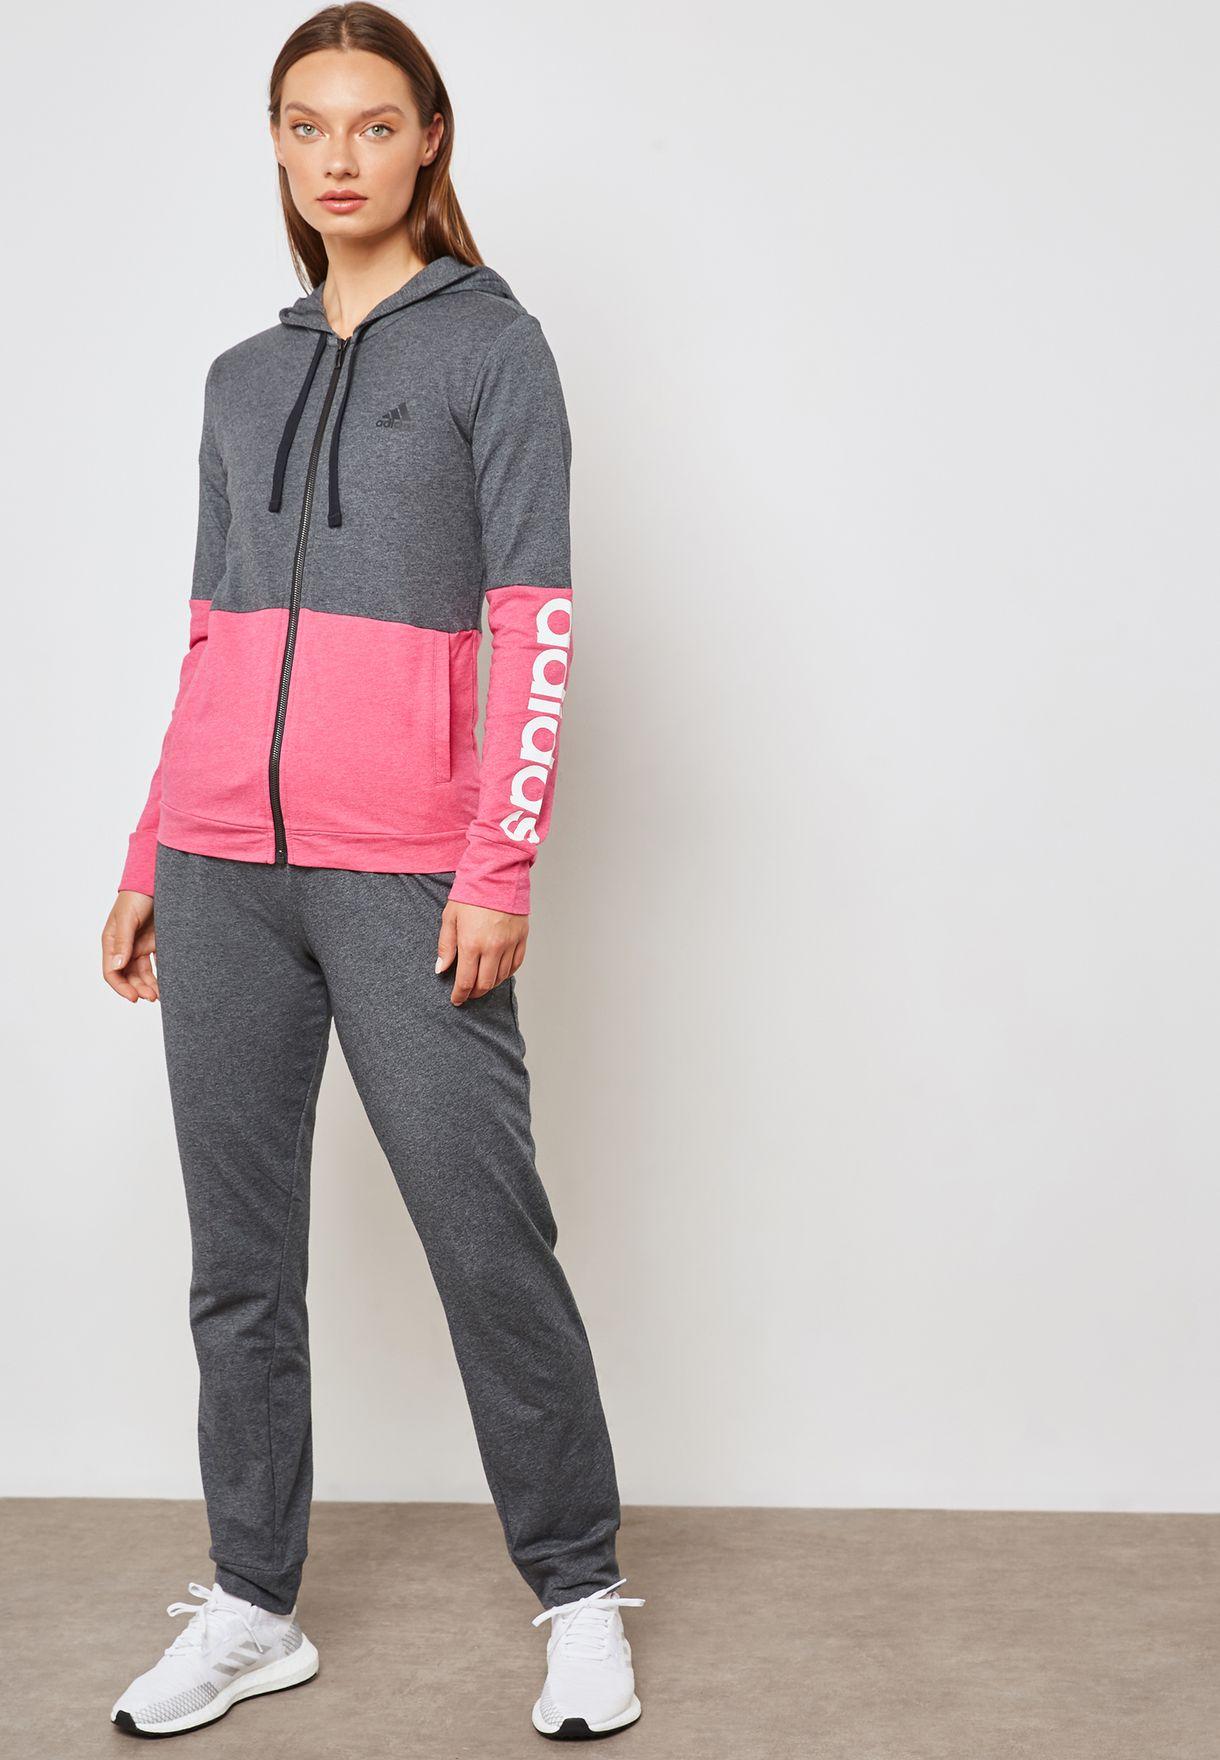 93d526d22 تسوق بدلة رياضية (جاكيت + بنطال) ماركة اديداس لون رمادي CZ2328 في ...